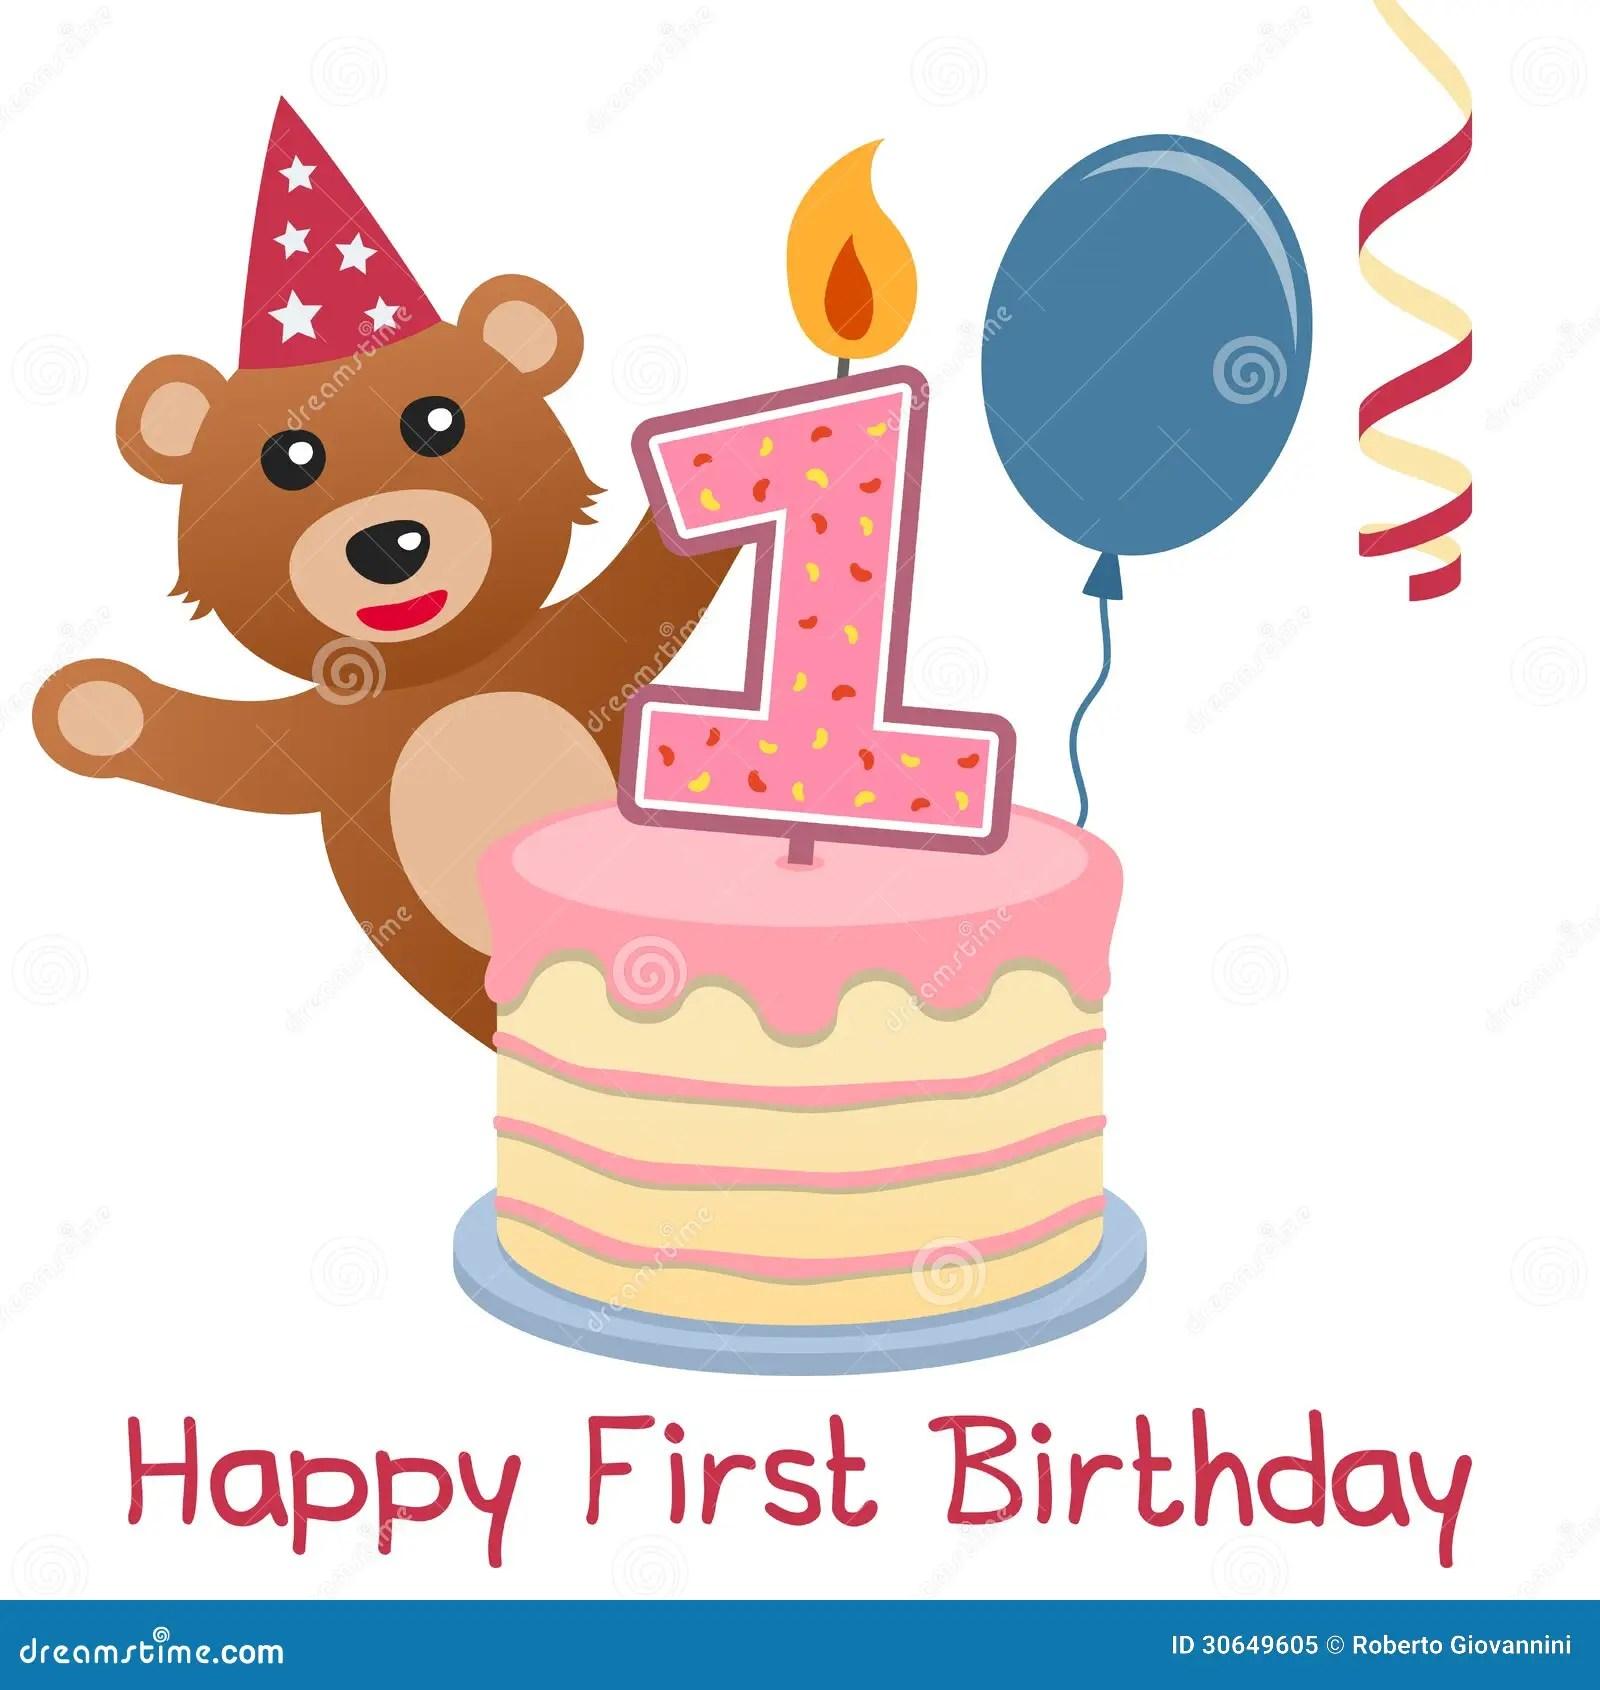 Erster Geburtstag Teddy Bear Vektor Abbildung